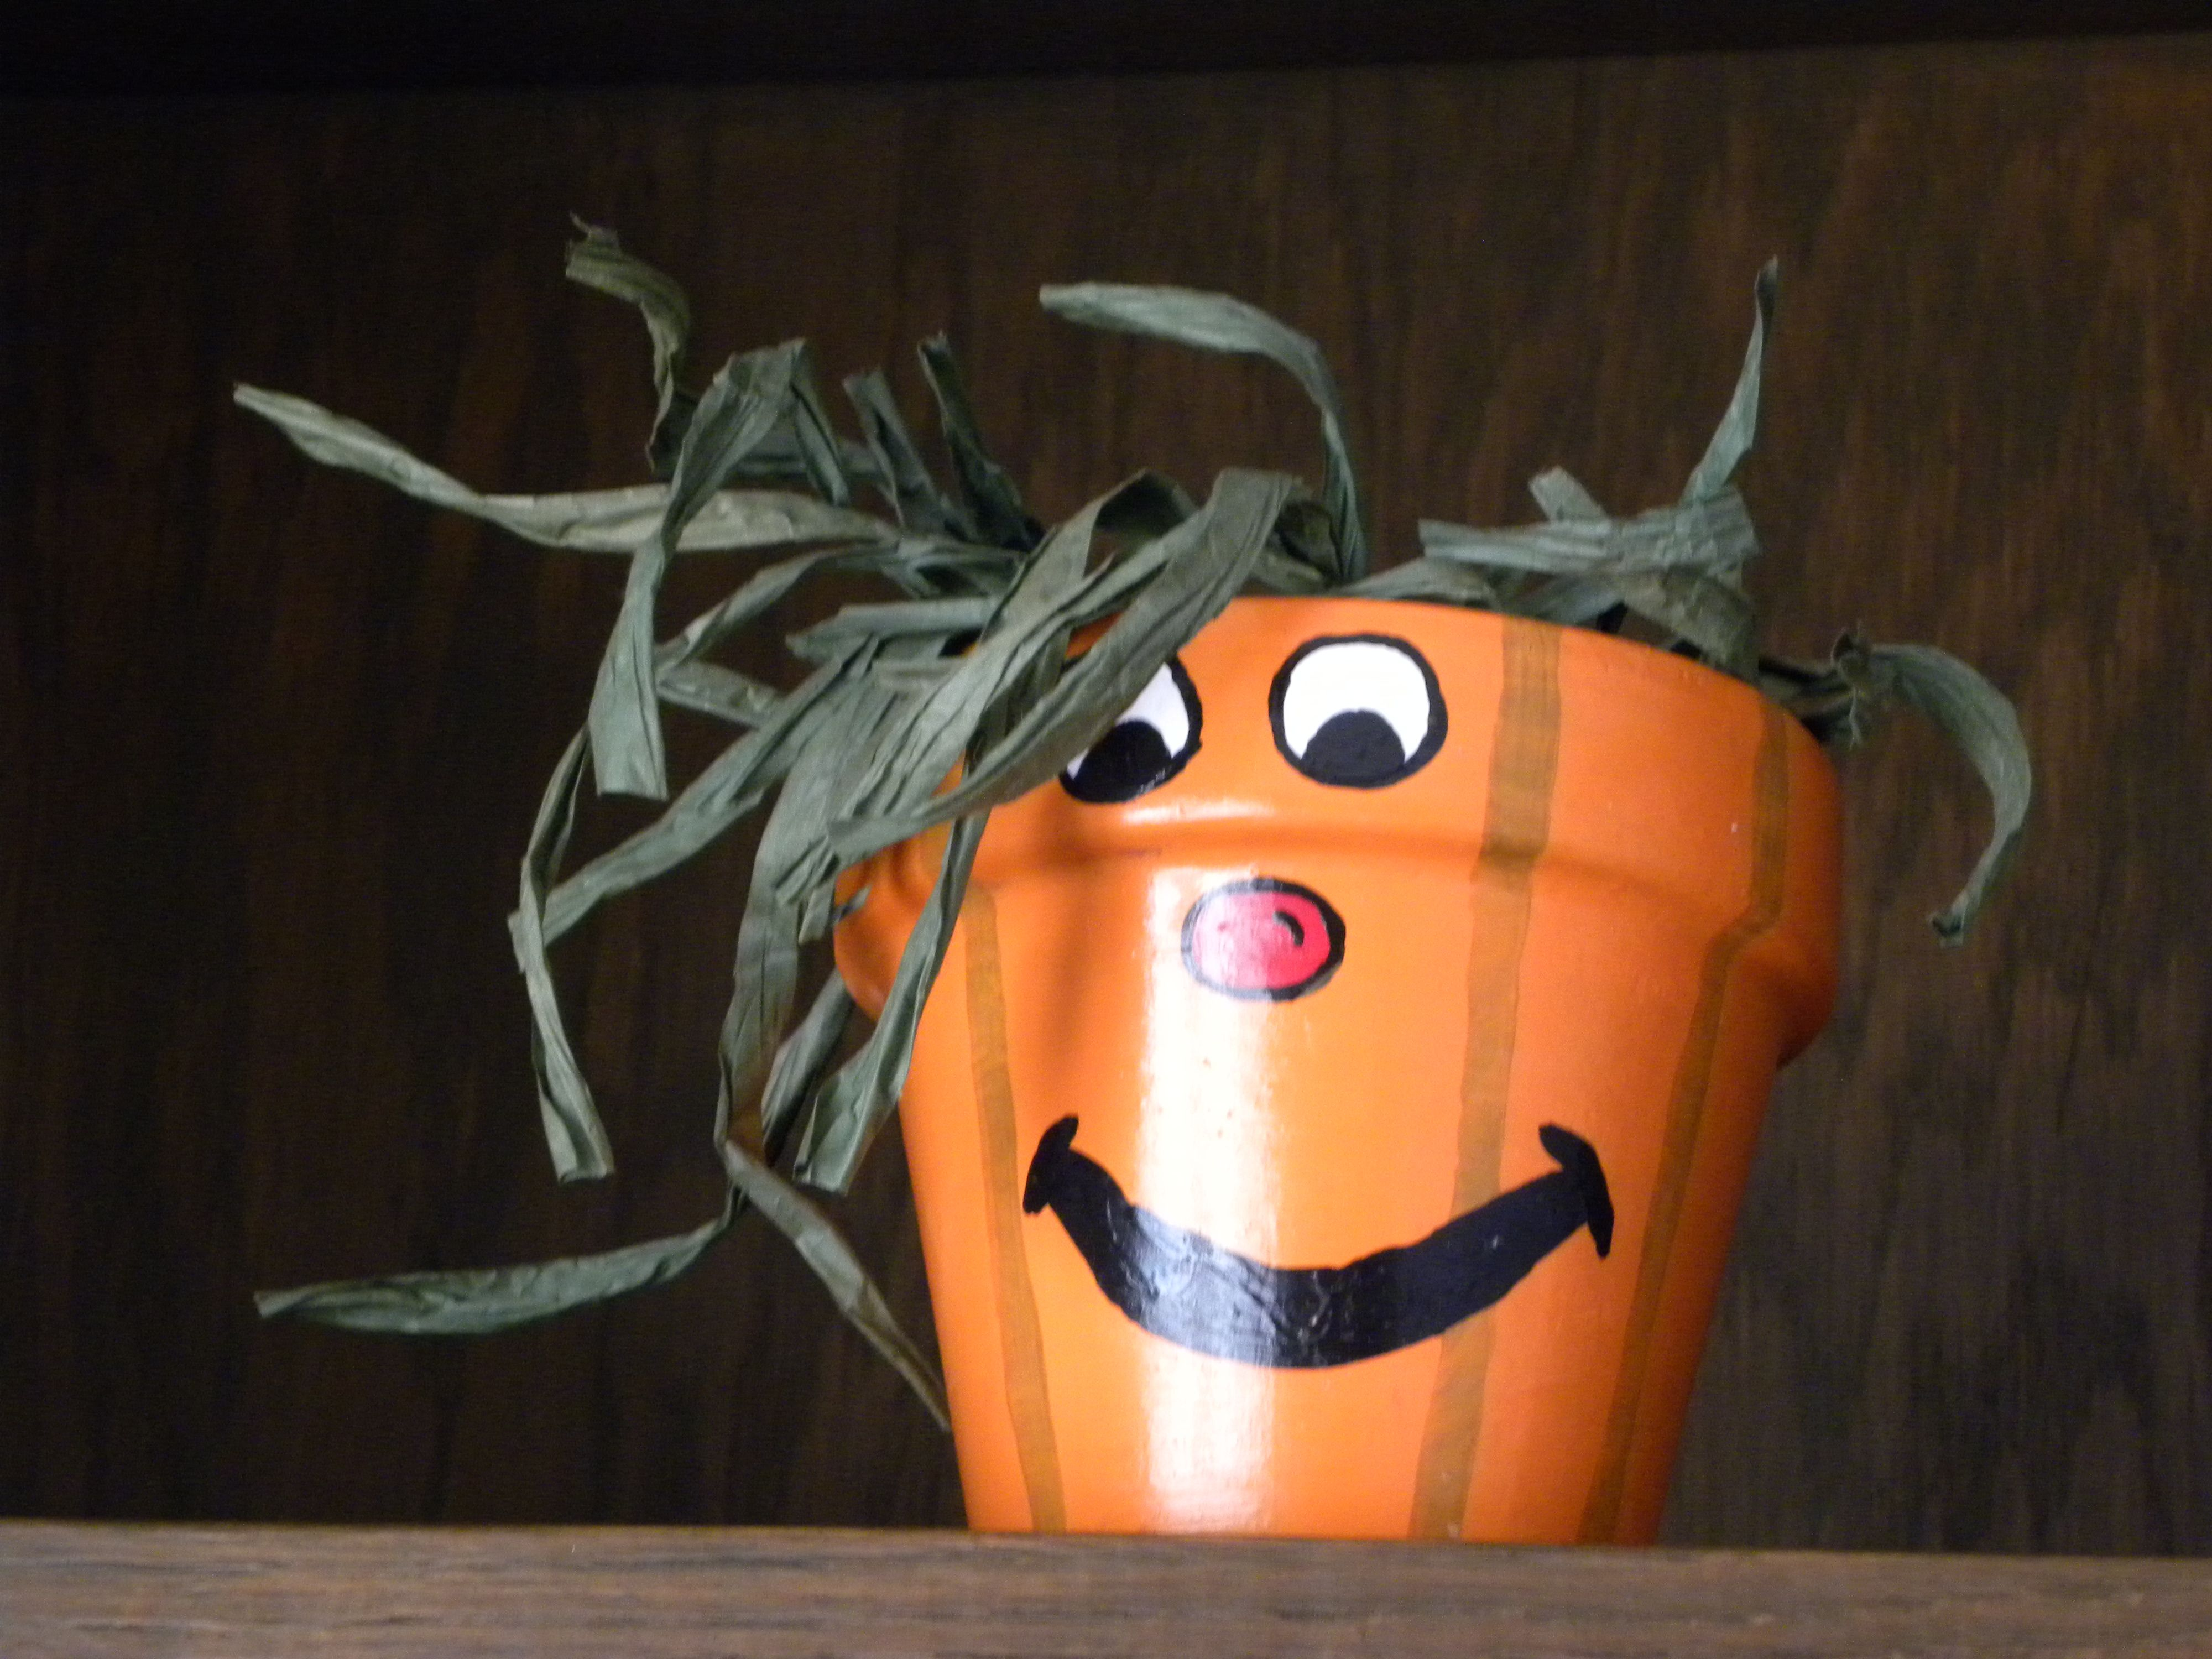 Two Piece Vintage Terra Cotta Pumpkin By Shavingkitsuppplies On Etsy Vintage Halloween Pieces Vintage Cute Halloween